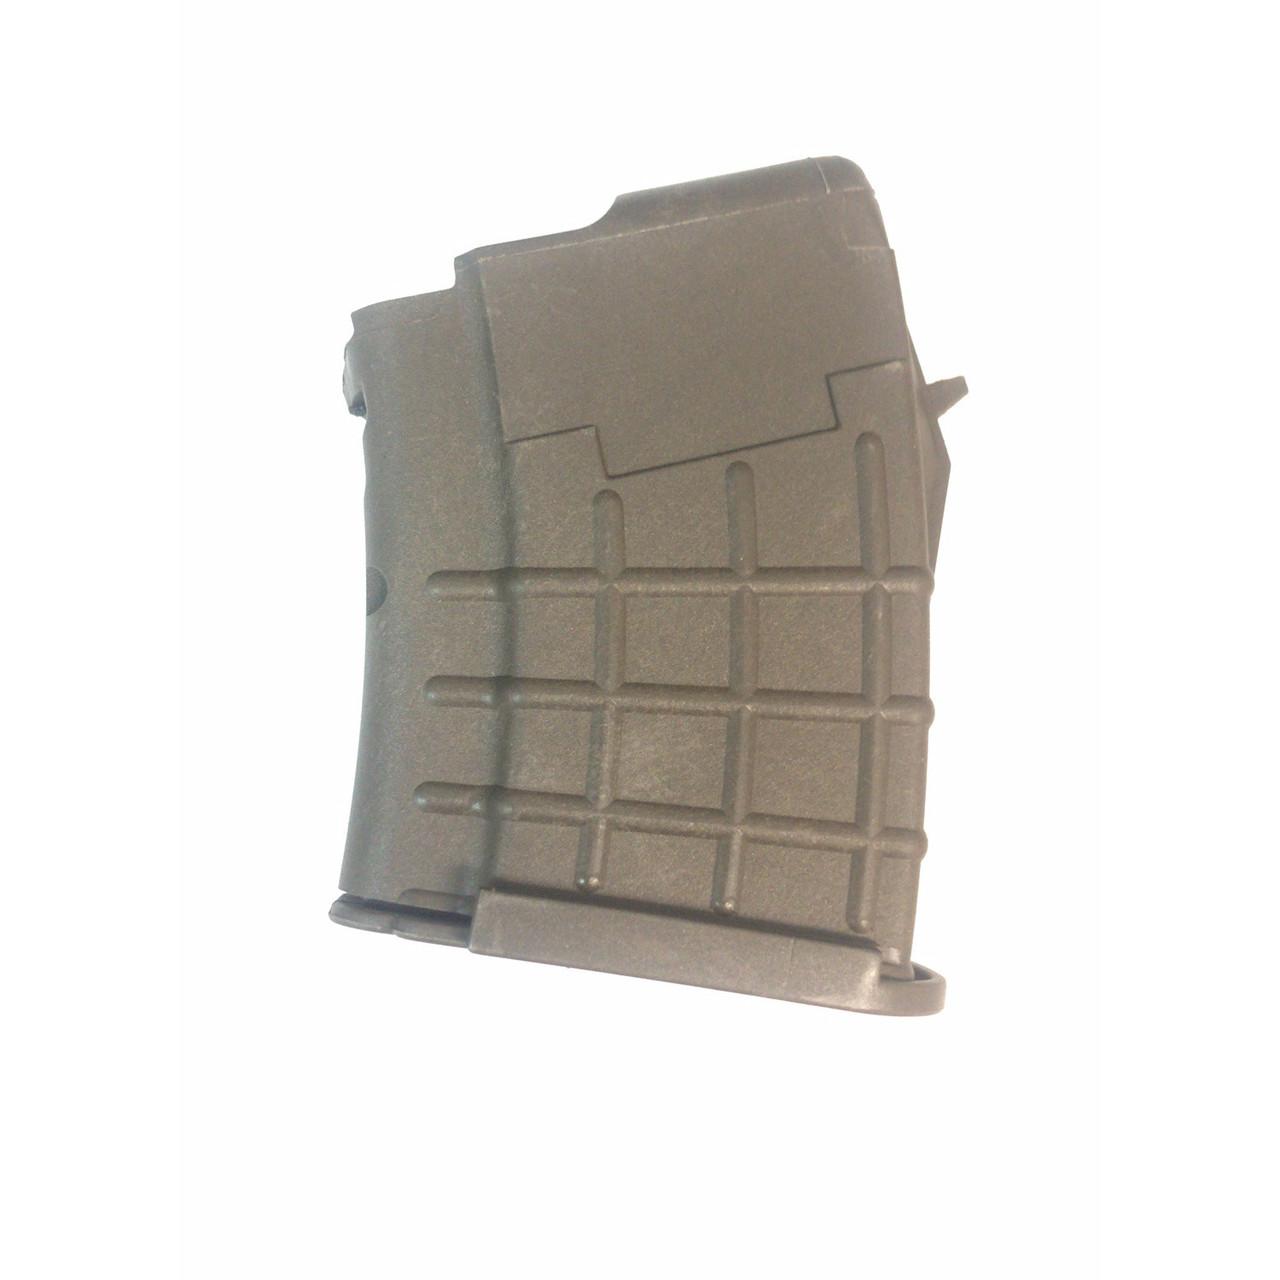 AK-47® 7.62x39mm (5) Rd - Olive Drab Polymer